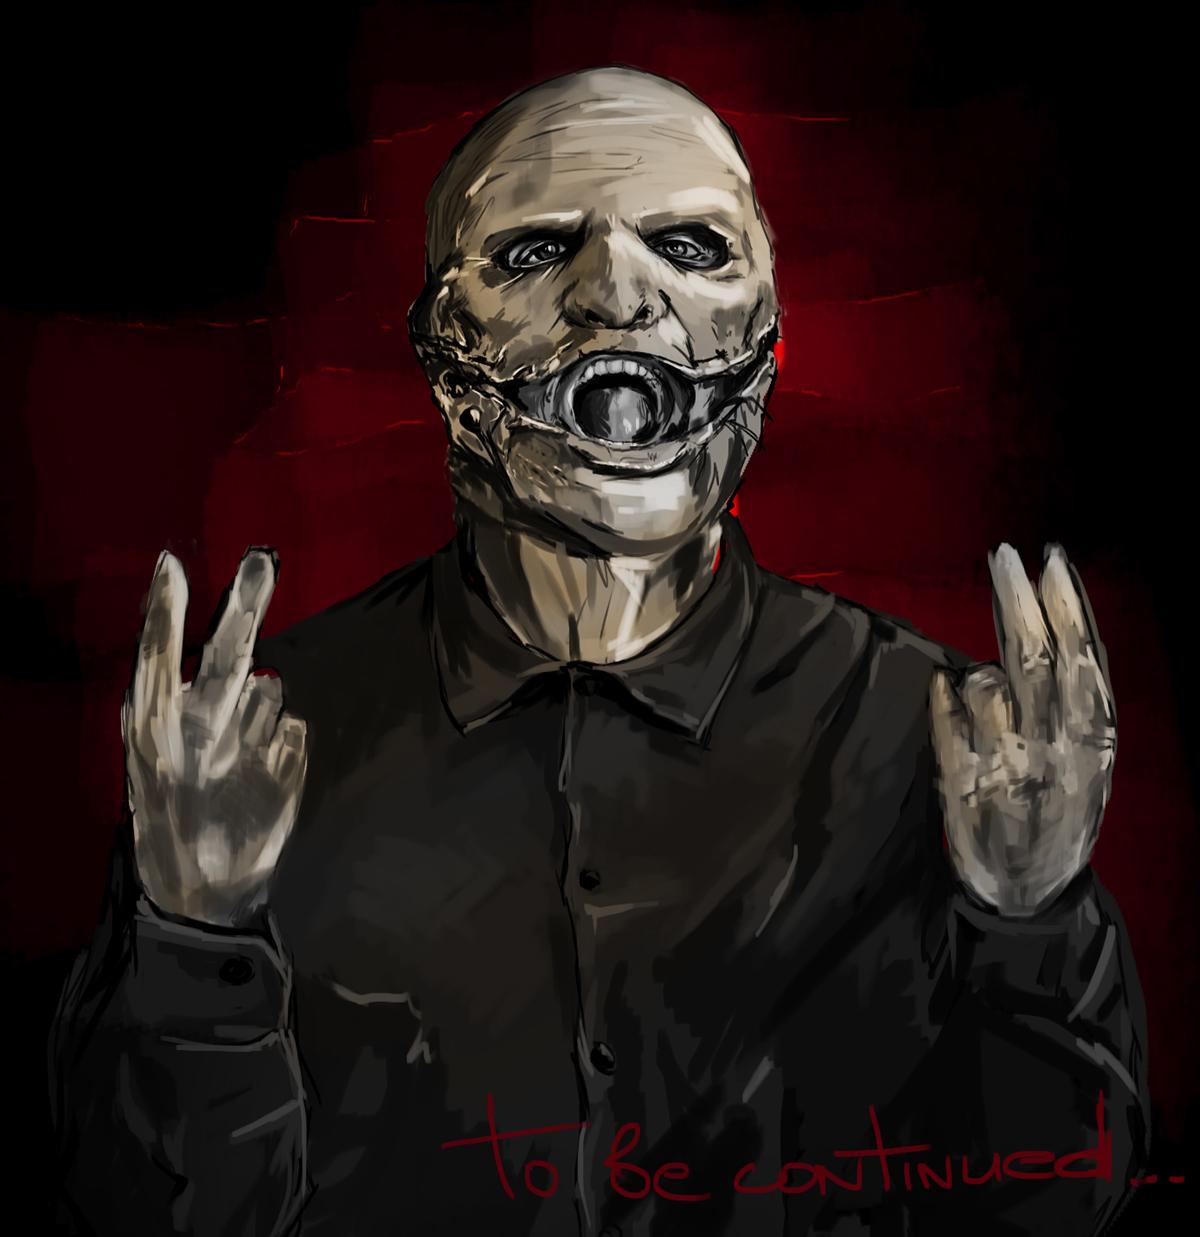 Slipknot / Corey Taylor Poster On Behance